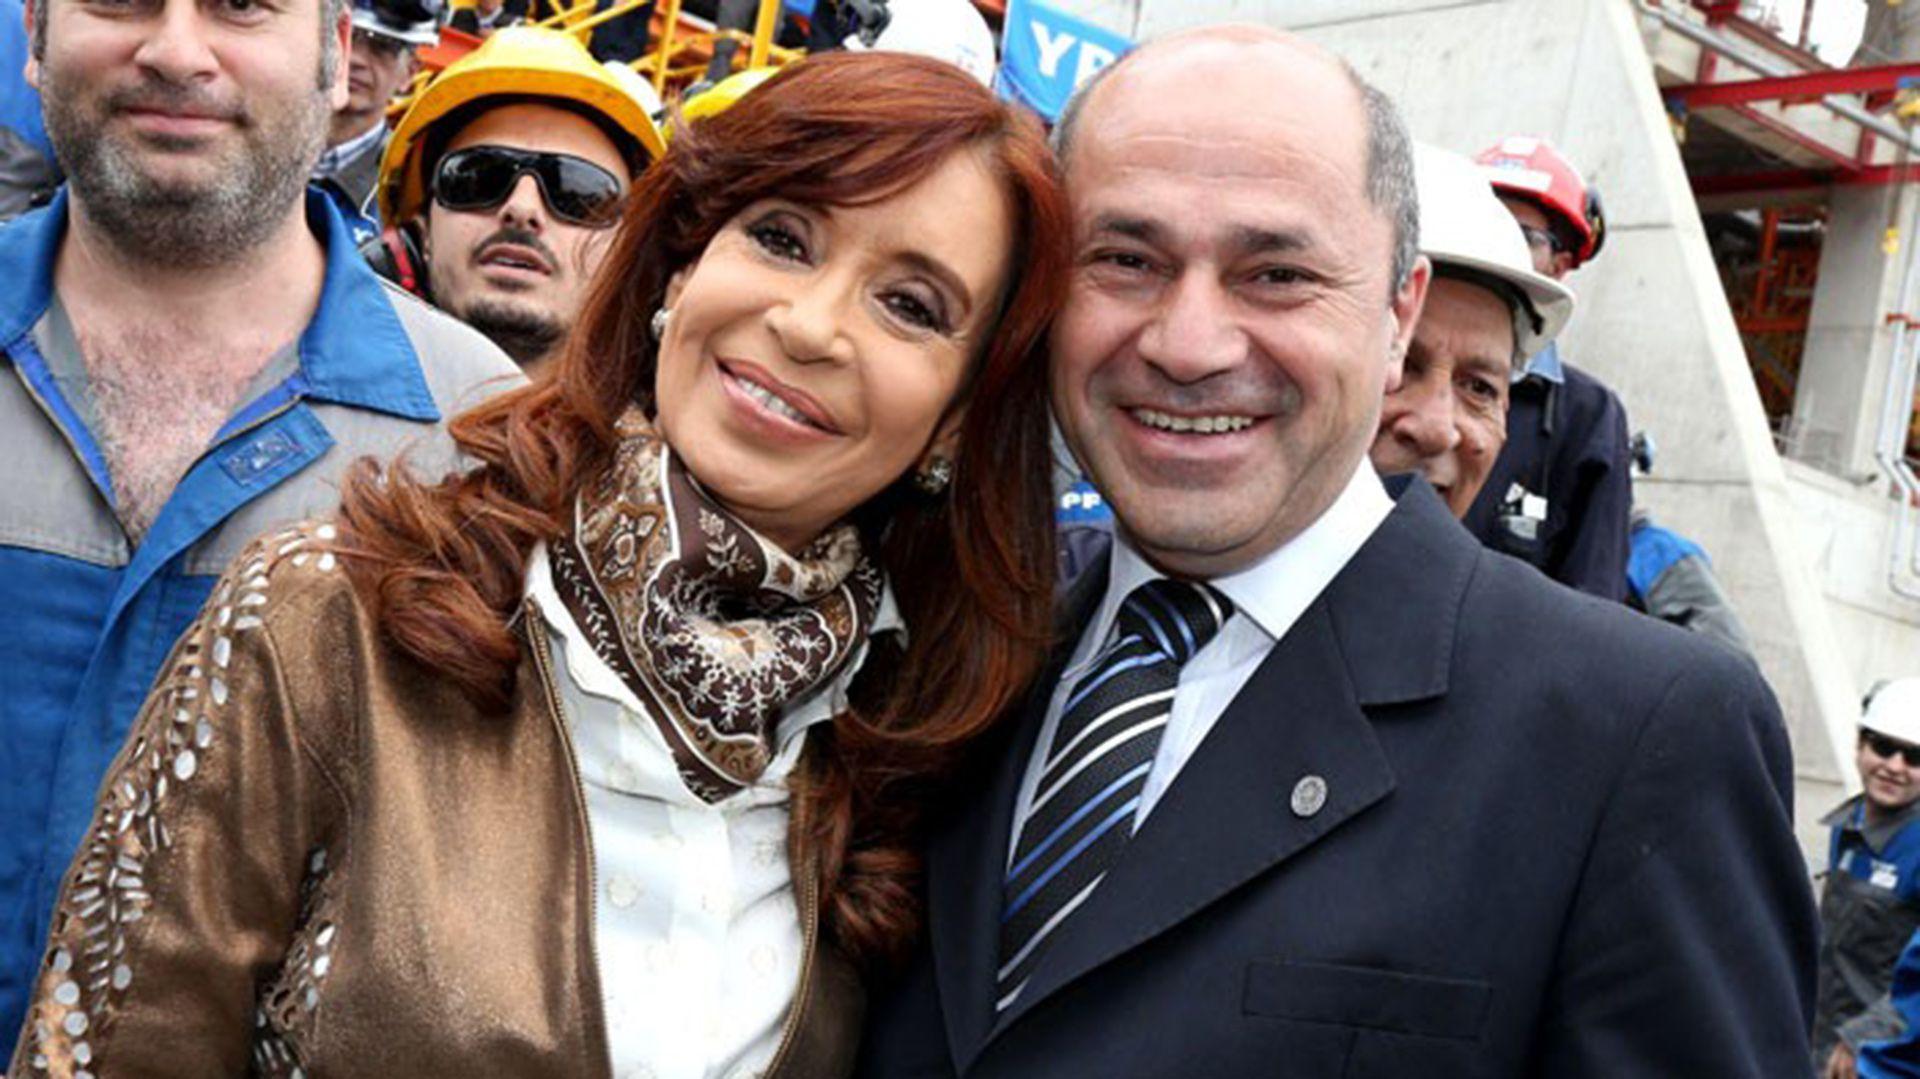 Mario Secco, uno de los intendentes leales a Cristina Kirchner (Prensa Ensenada)